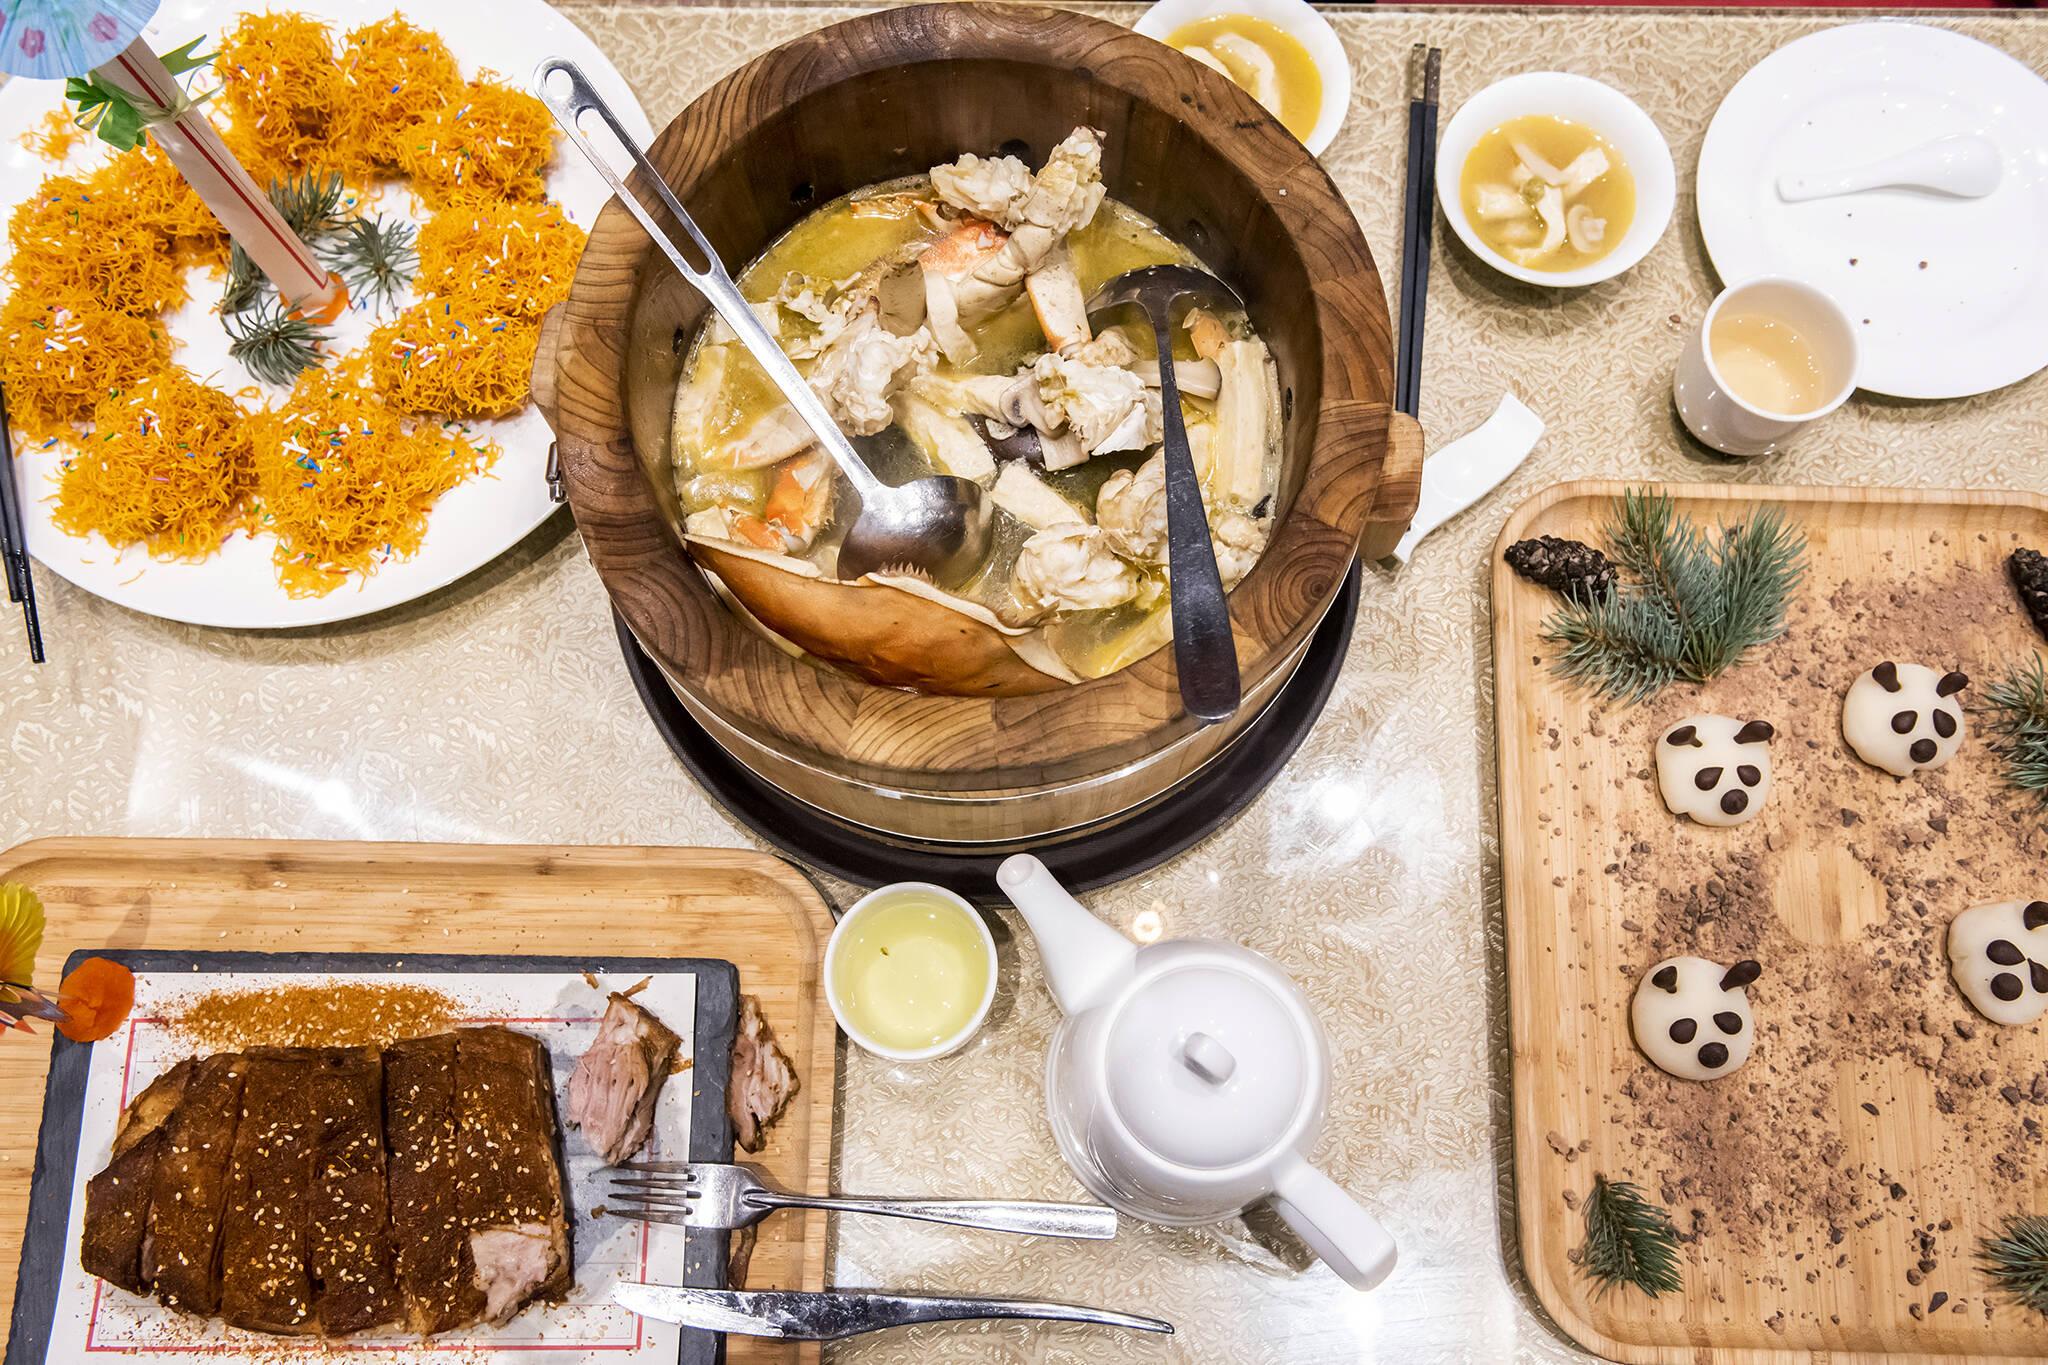 816 cuisine toronto